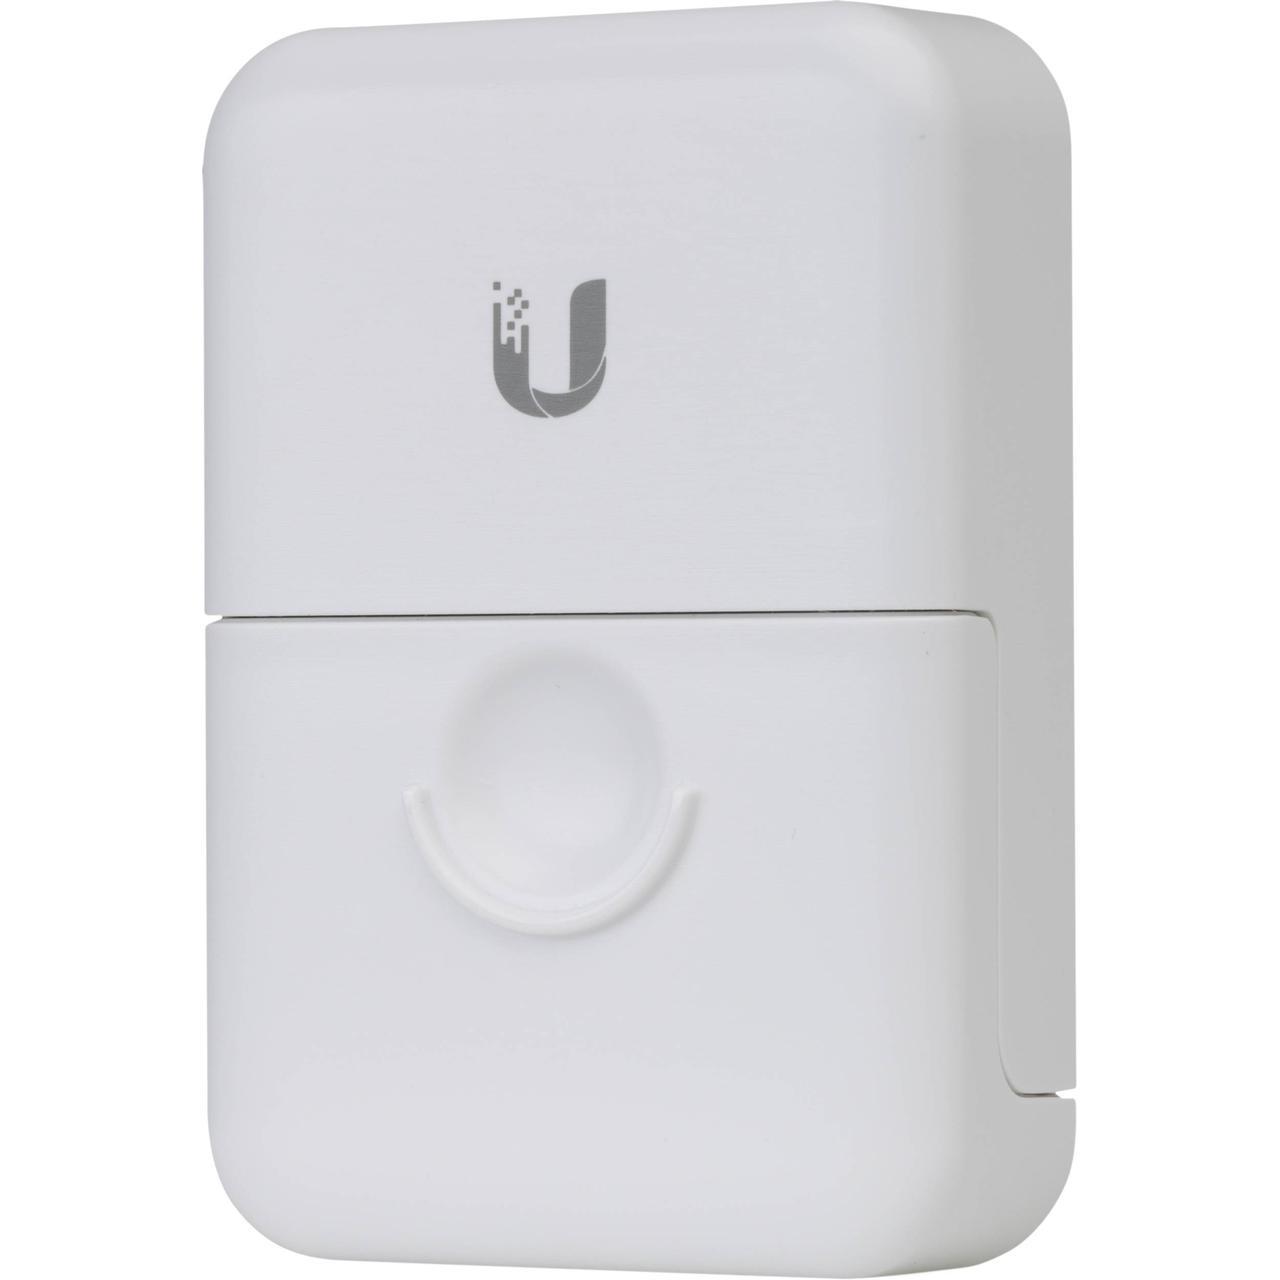 Грозозащита Ubiquiti ETH-SP-G2 Ethernet Surge Protector, Gen 2